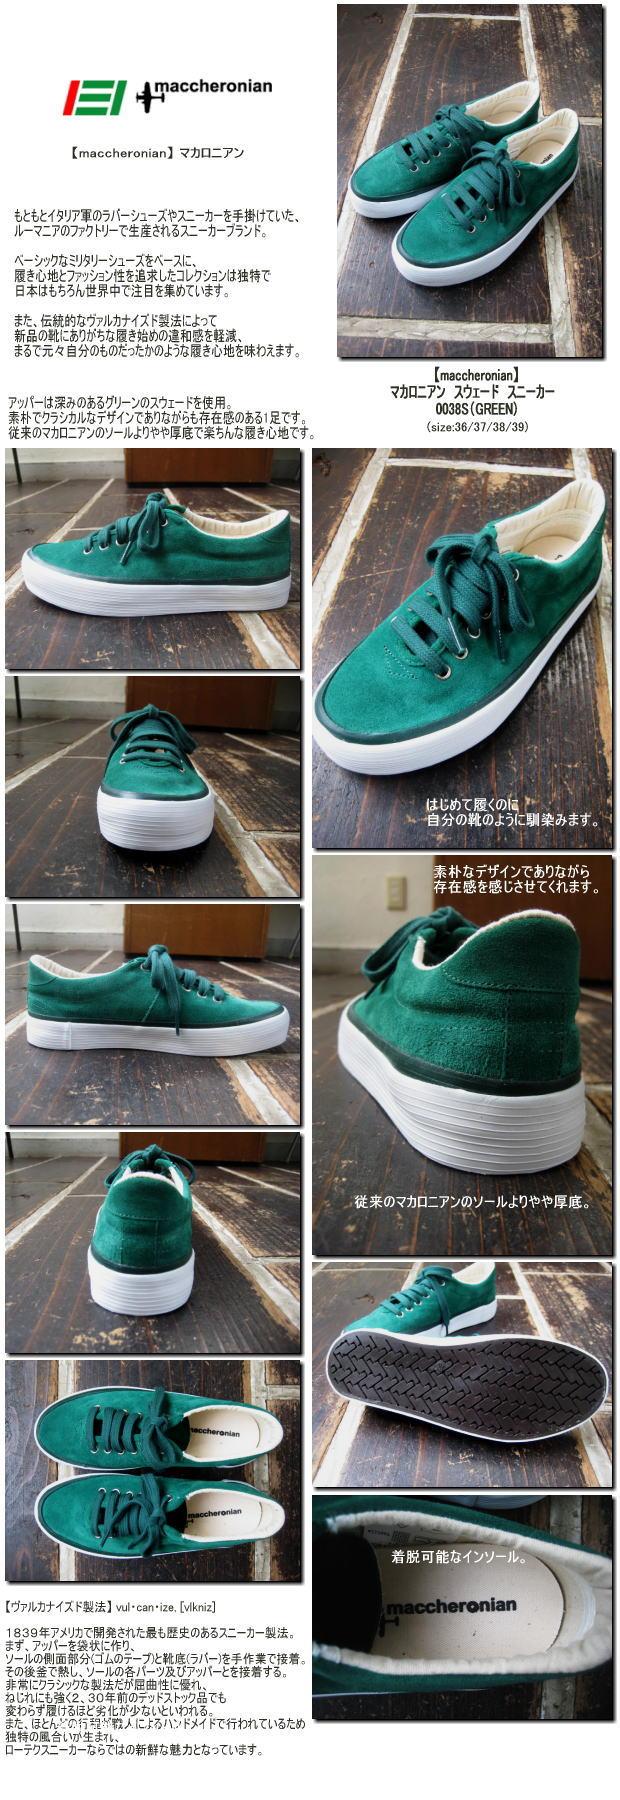 【maccheronian】マカロニアン レディース スウェード スニーカー 0038S color GREEN